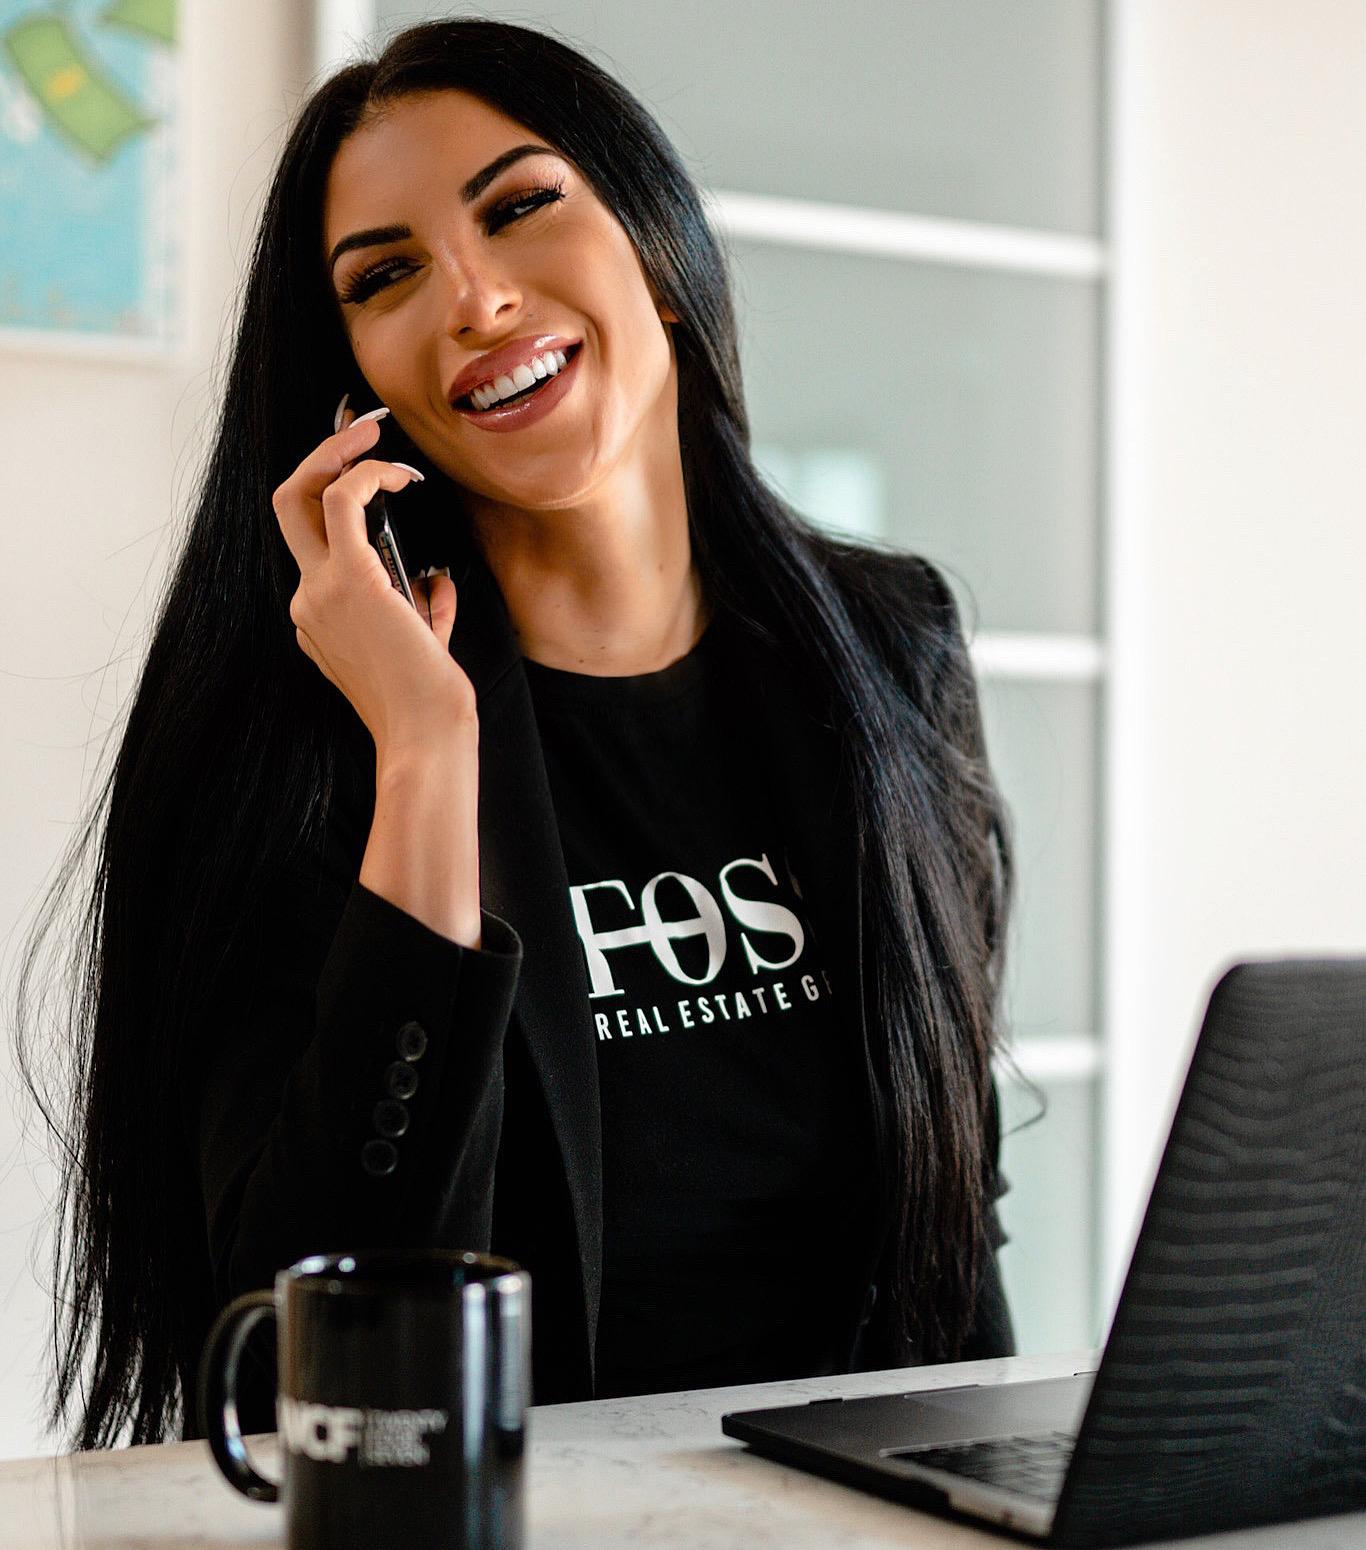 Laura Giselle Foss Real Estate Agent